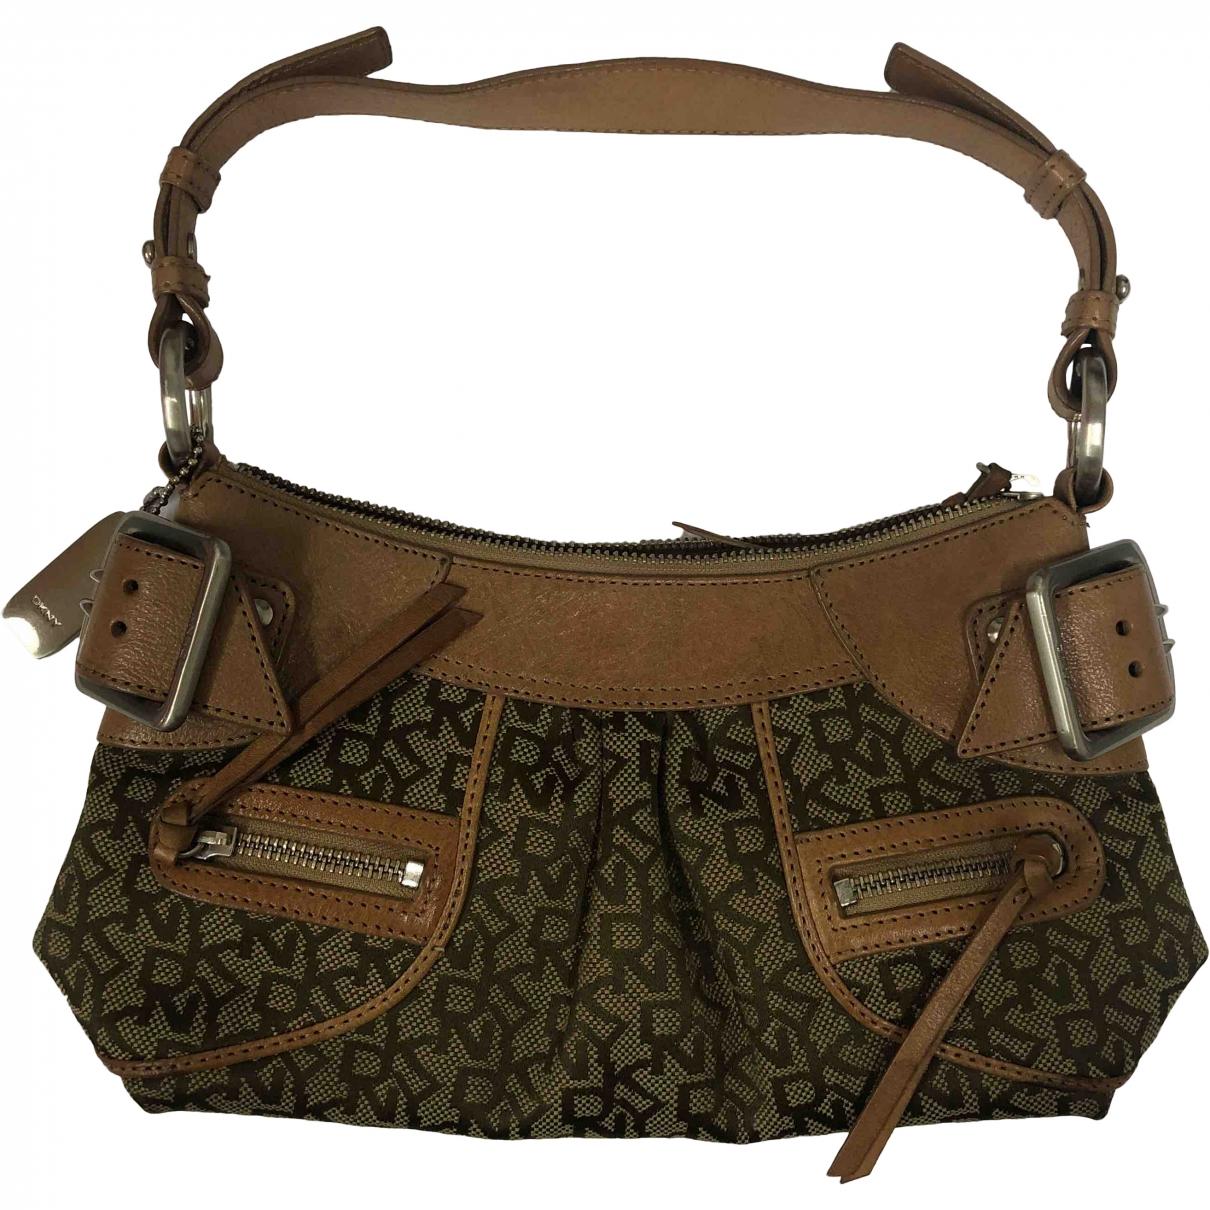 Dkny \N Handtasche in  Gruen Leder